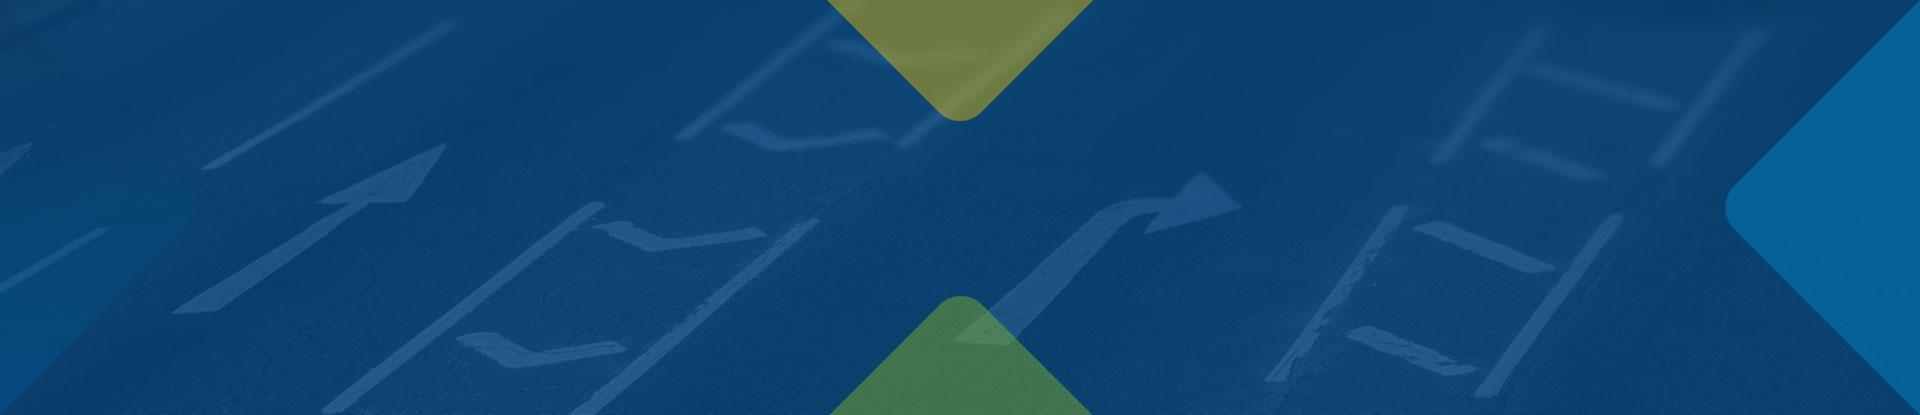 SynX Banner Green Fleet and Ecodriving